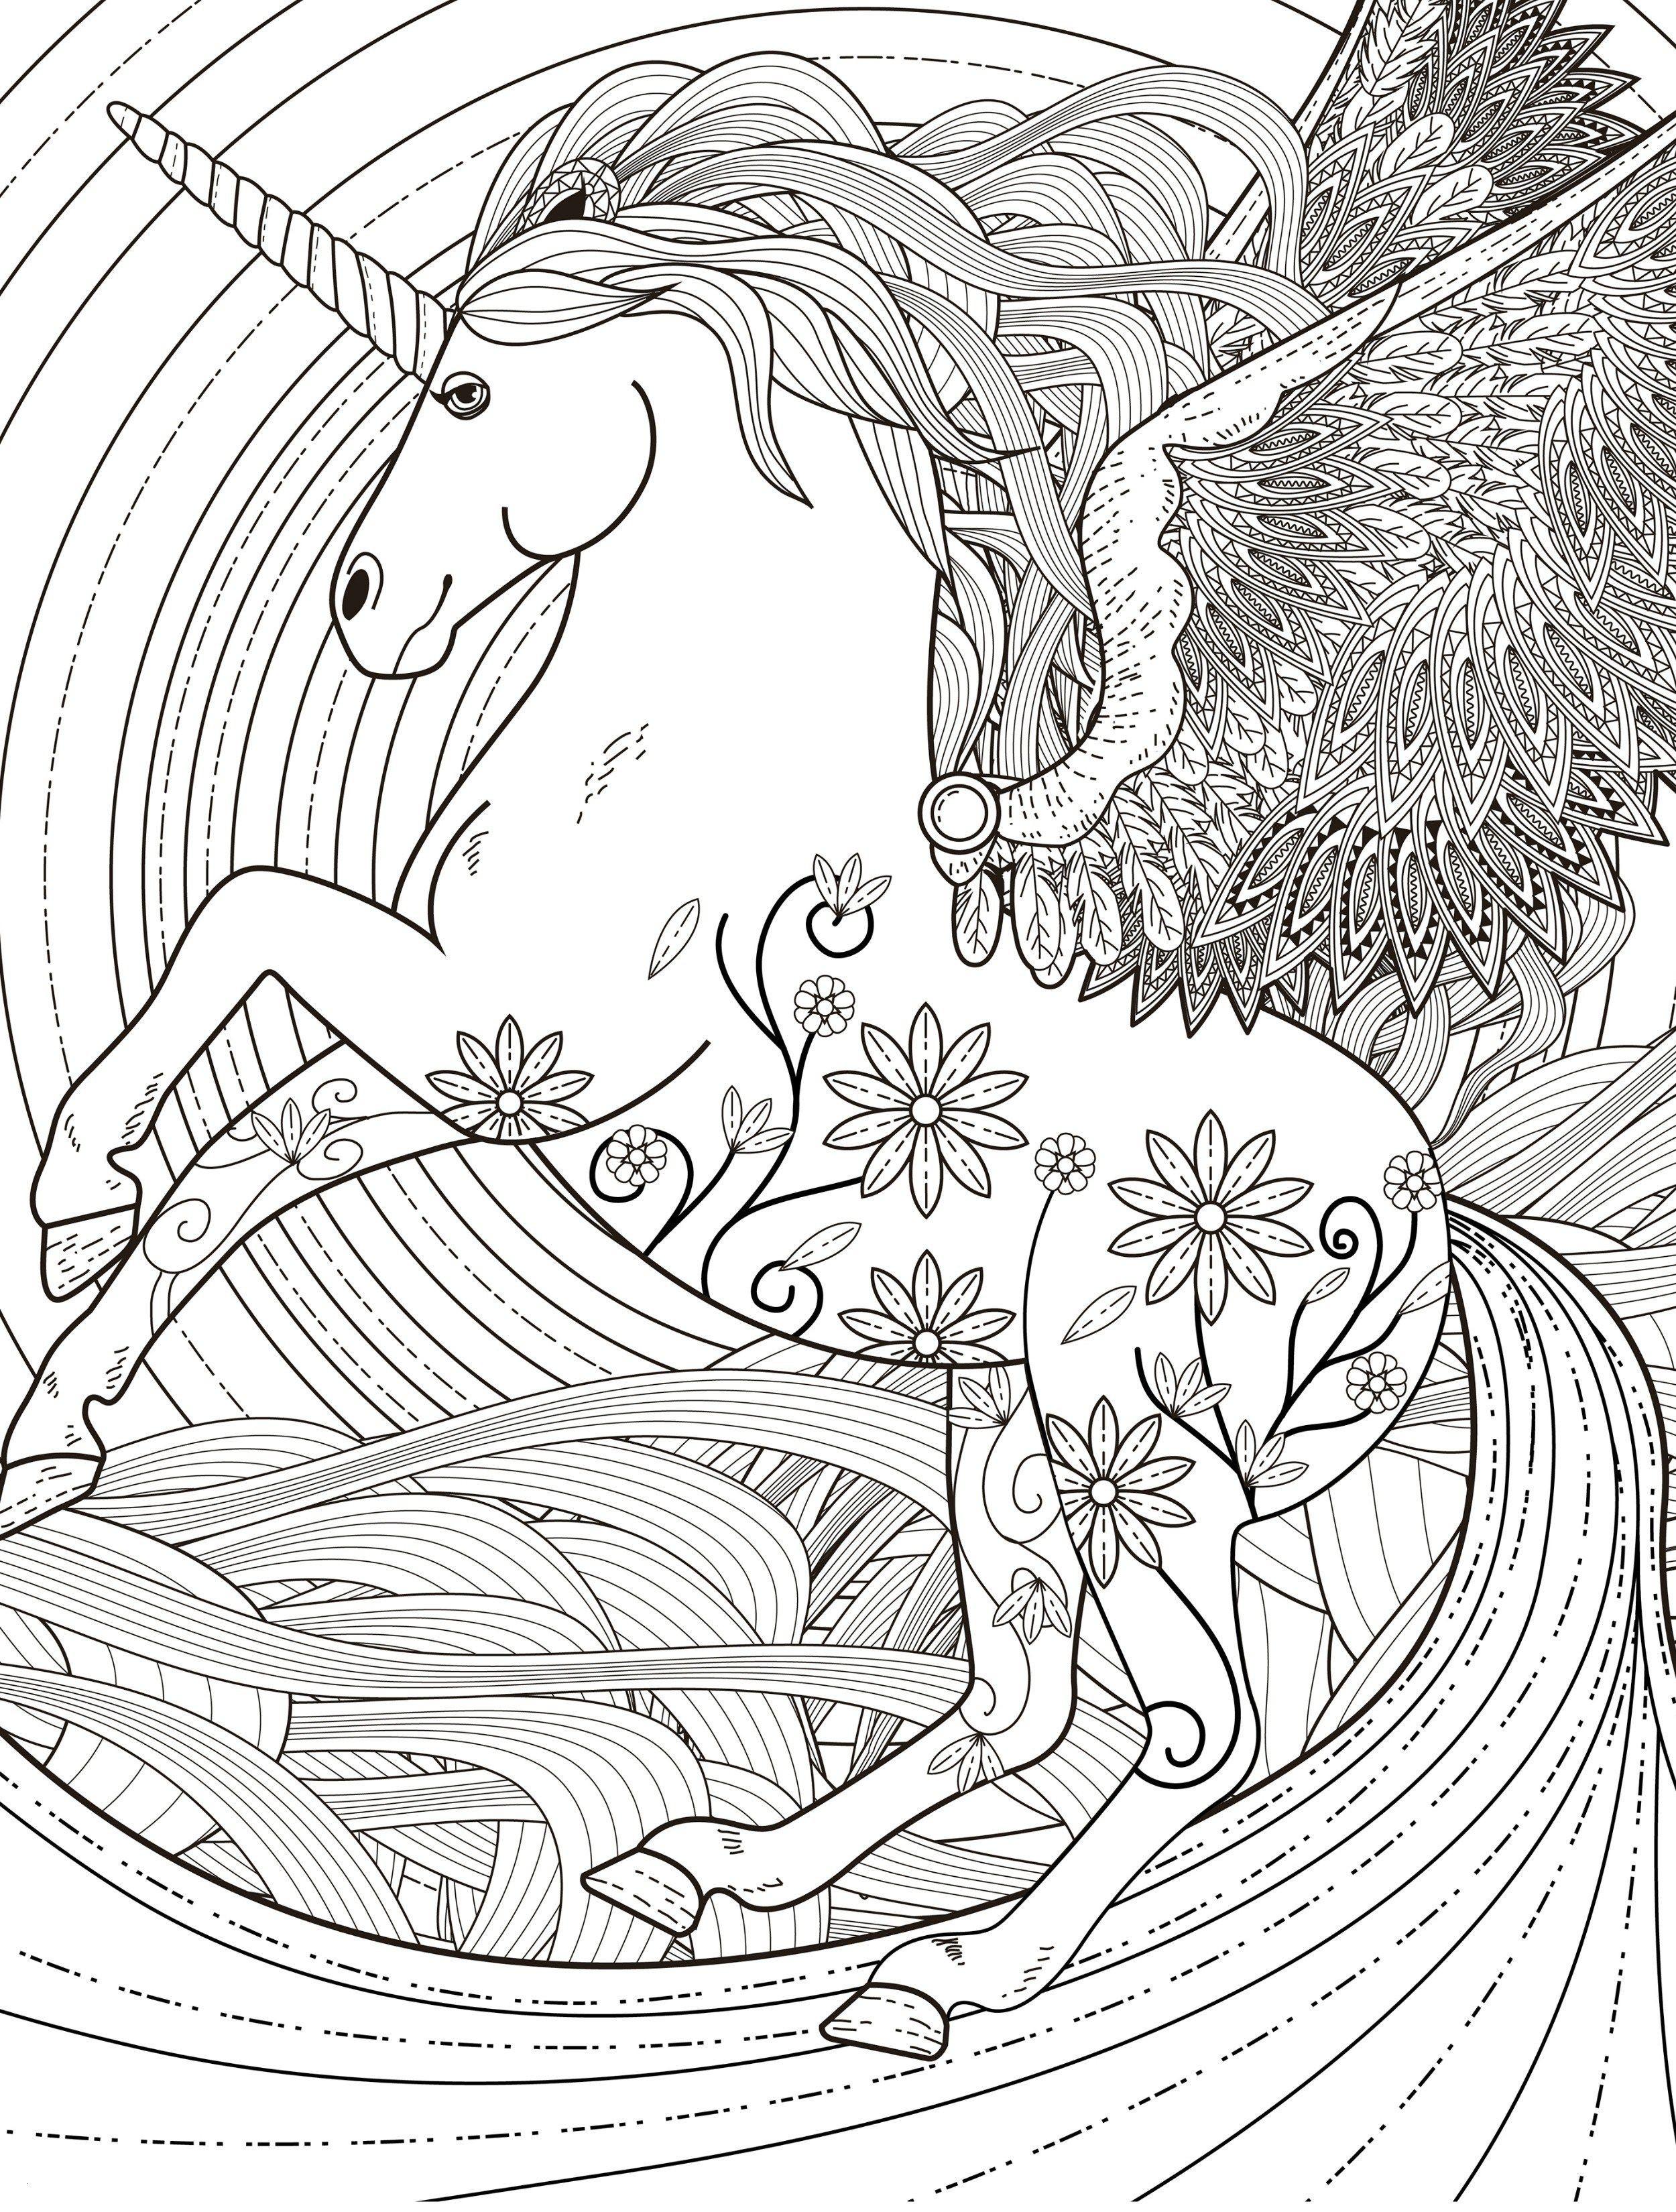 Pegasus Zum Ausmalen Neu Pegasus Adult Coloring Page Free Davlin Publishing Schön Sammlung